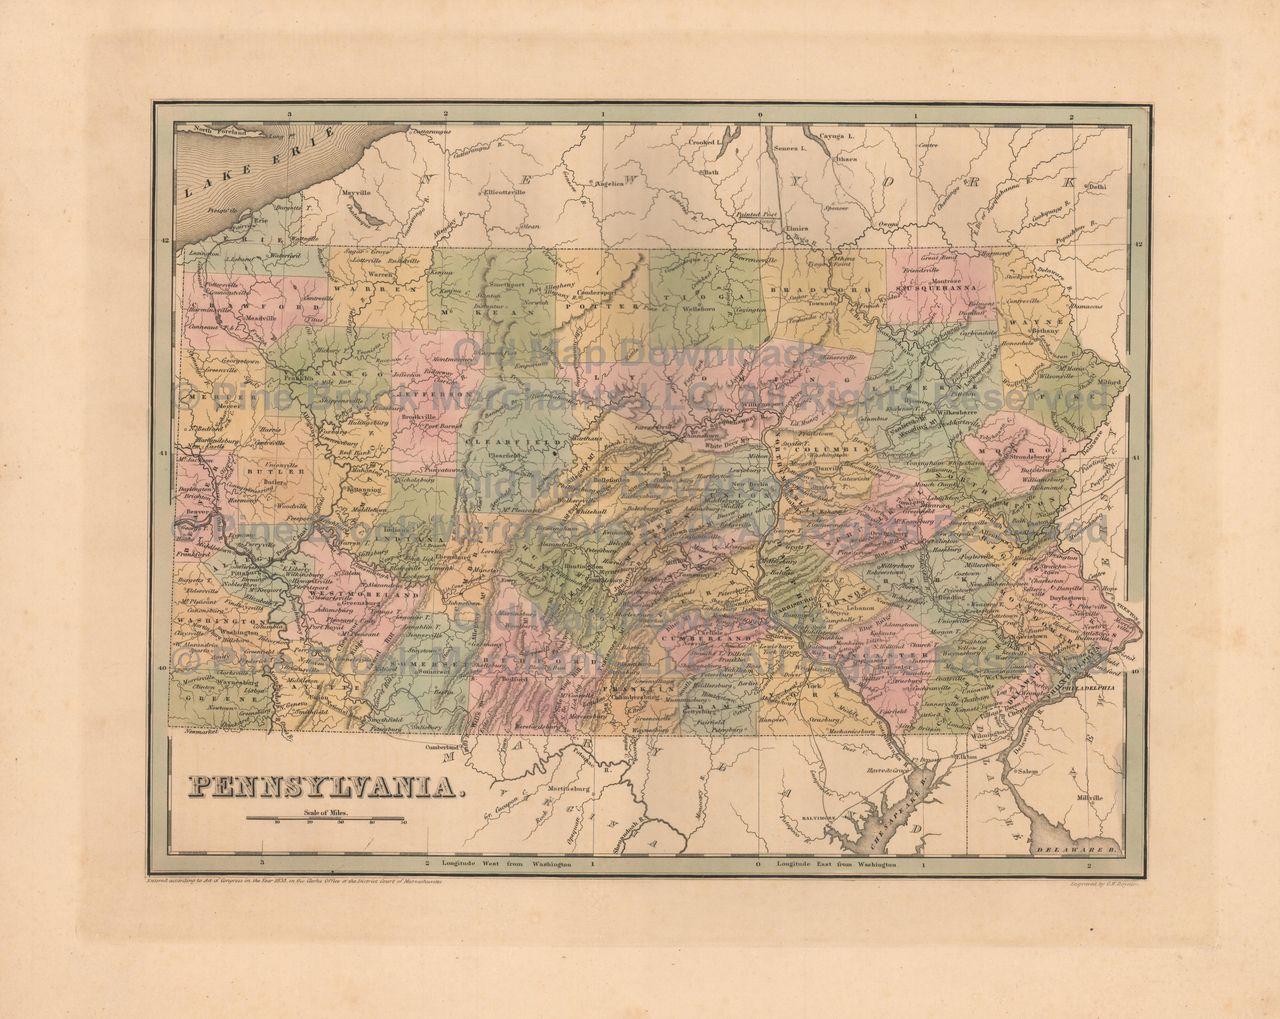 Pennsylvania old map bradford 1838 digital image scan